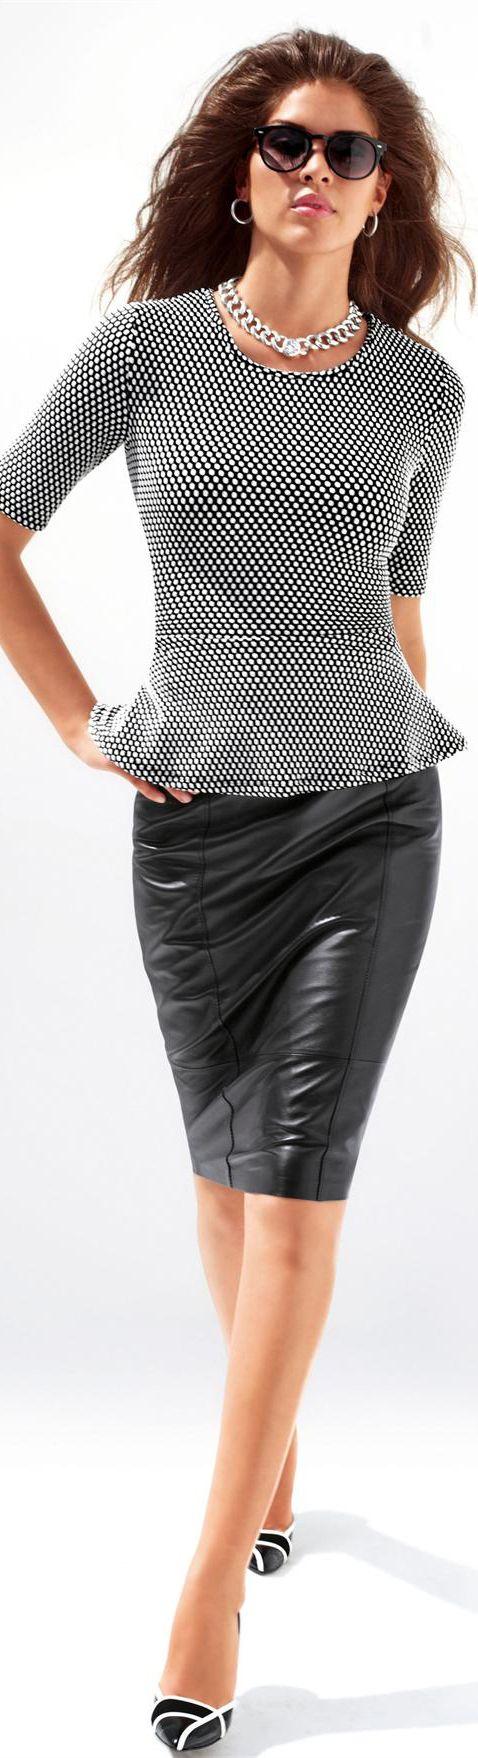 High Class Women's Fashion Collection